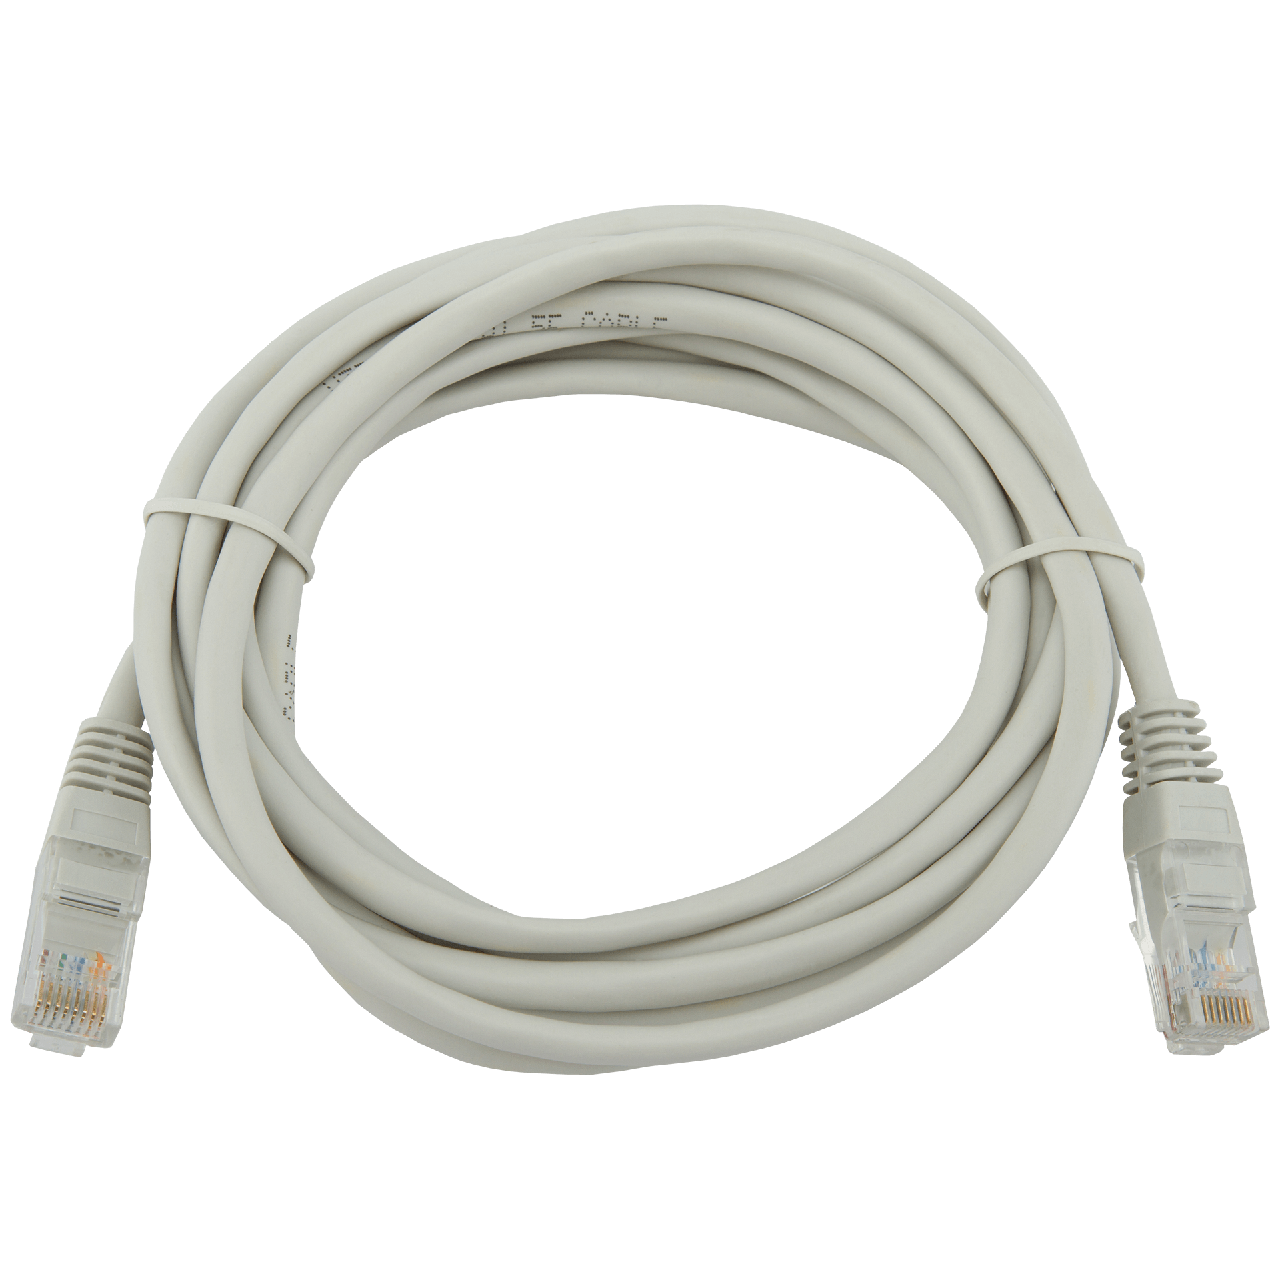 Патч-корд литой LogicPower UTP RJ45 кат. 5Е 3 м (серый)